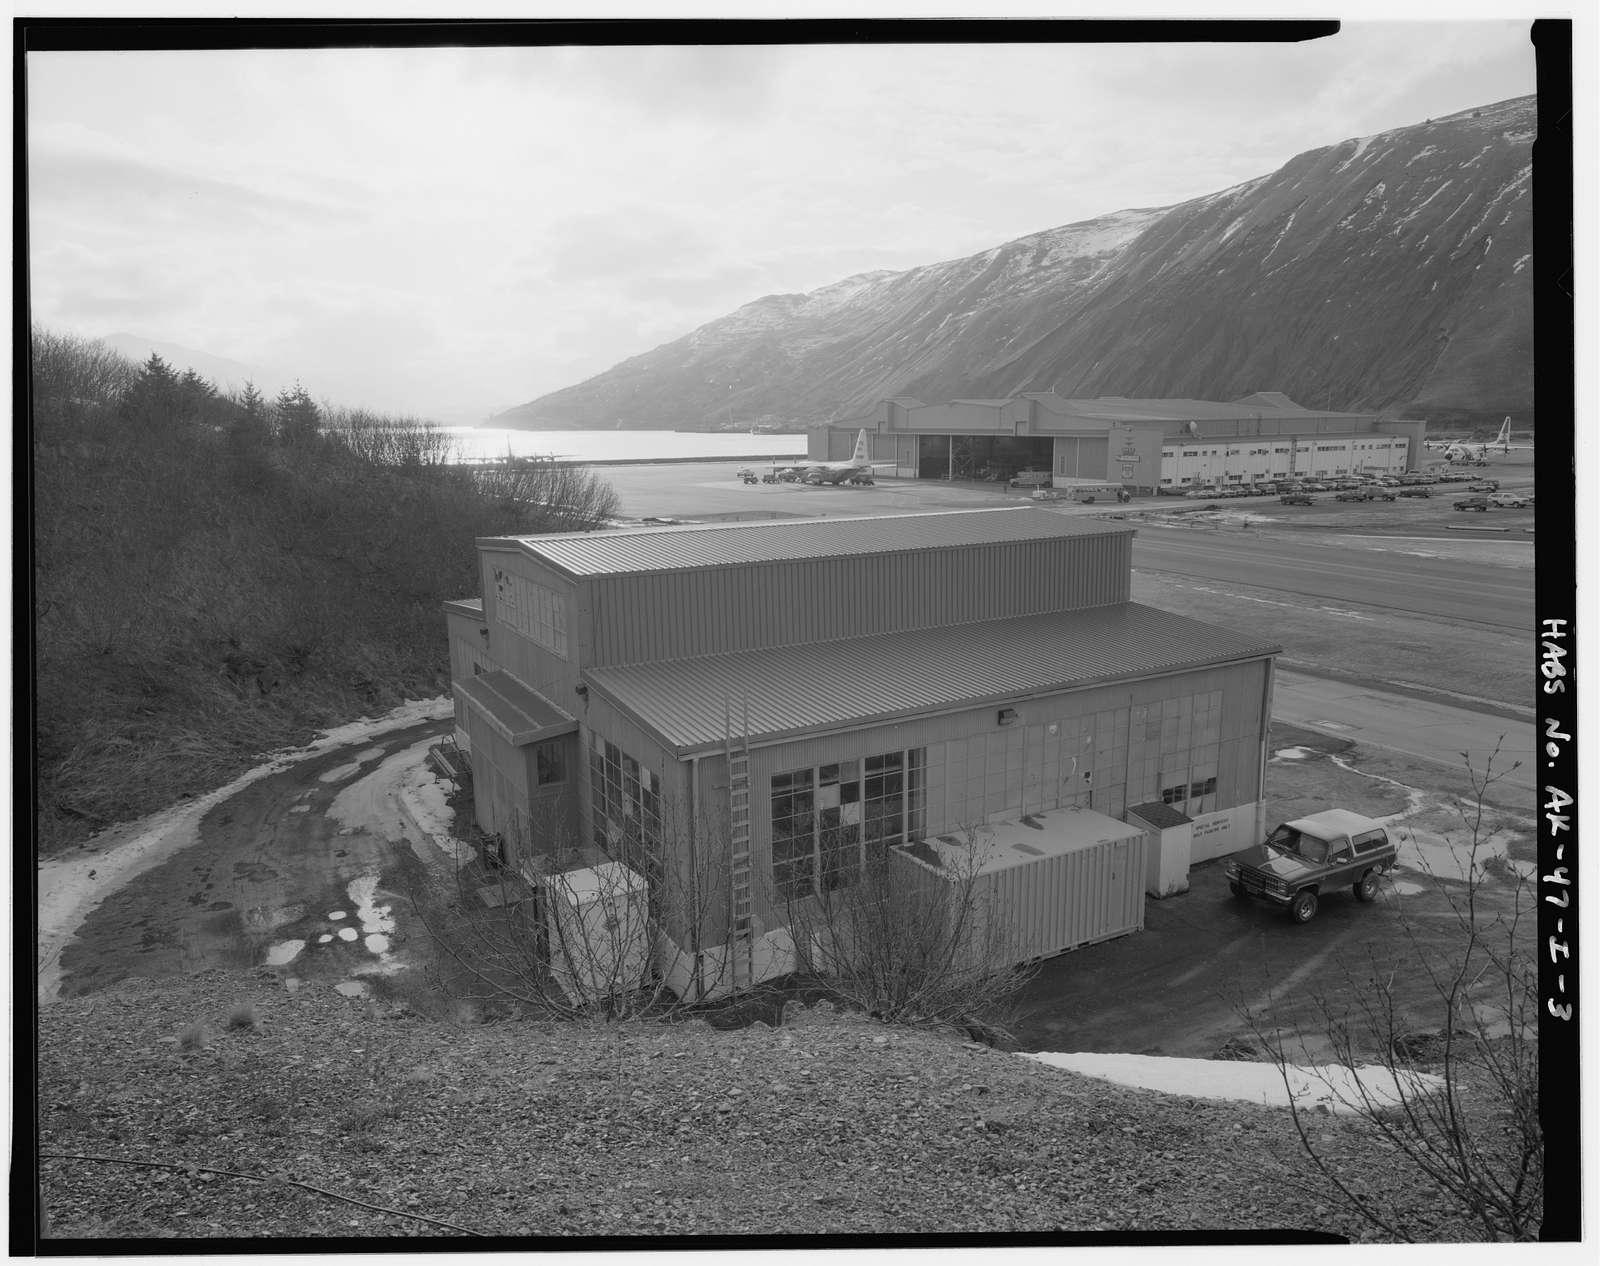 Kodiak Naval Operating Base, Boat House, U.S. Coast Guard Station, across the taxiway from Building No. 25 on Nyman Peninsula, Kodiak, Kodiak Island Borough, AK